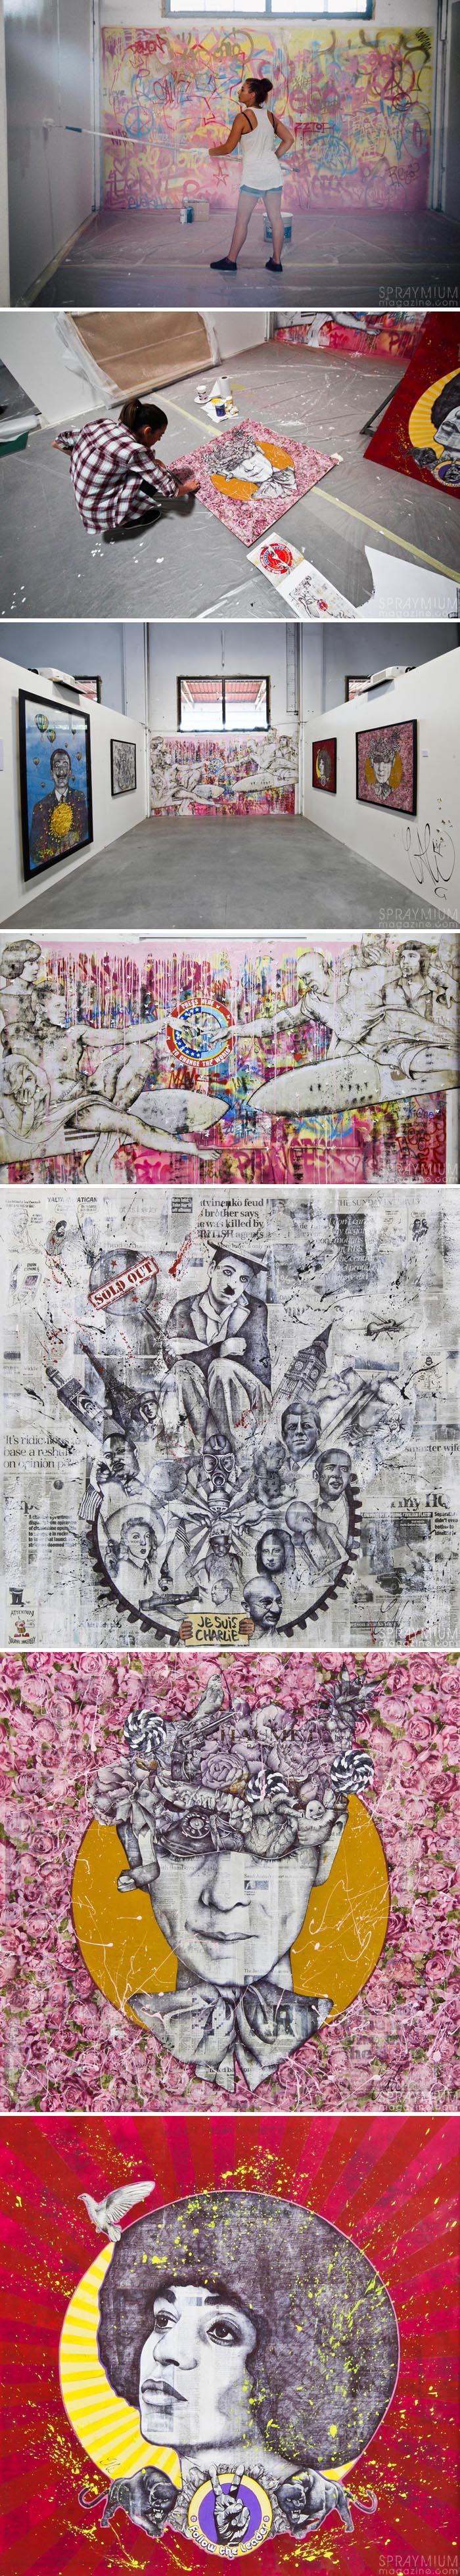 exposition mister freeze toulouse art urbain contemporain graffiti postgraffiti streetart muralism spraymium cali